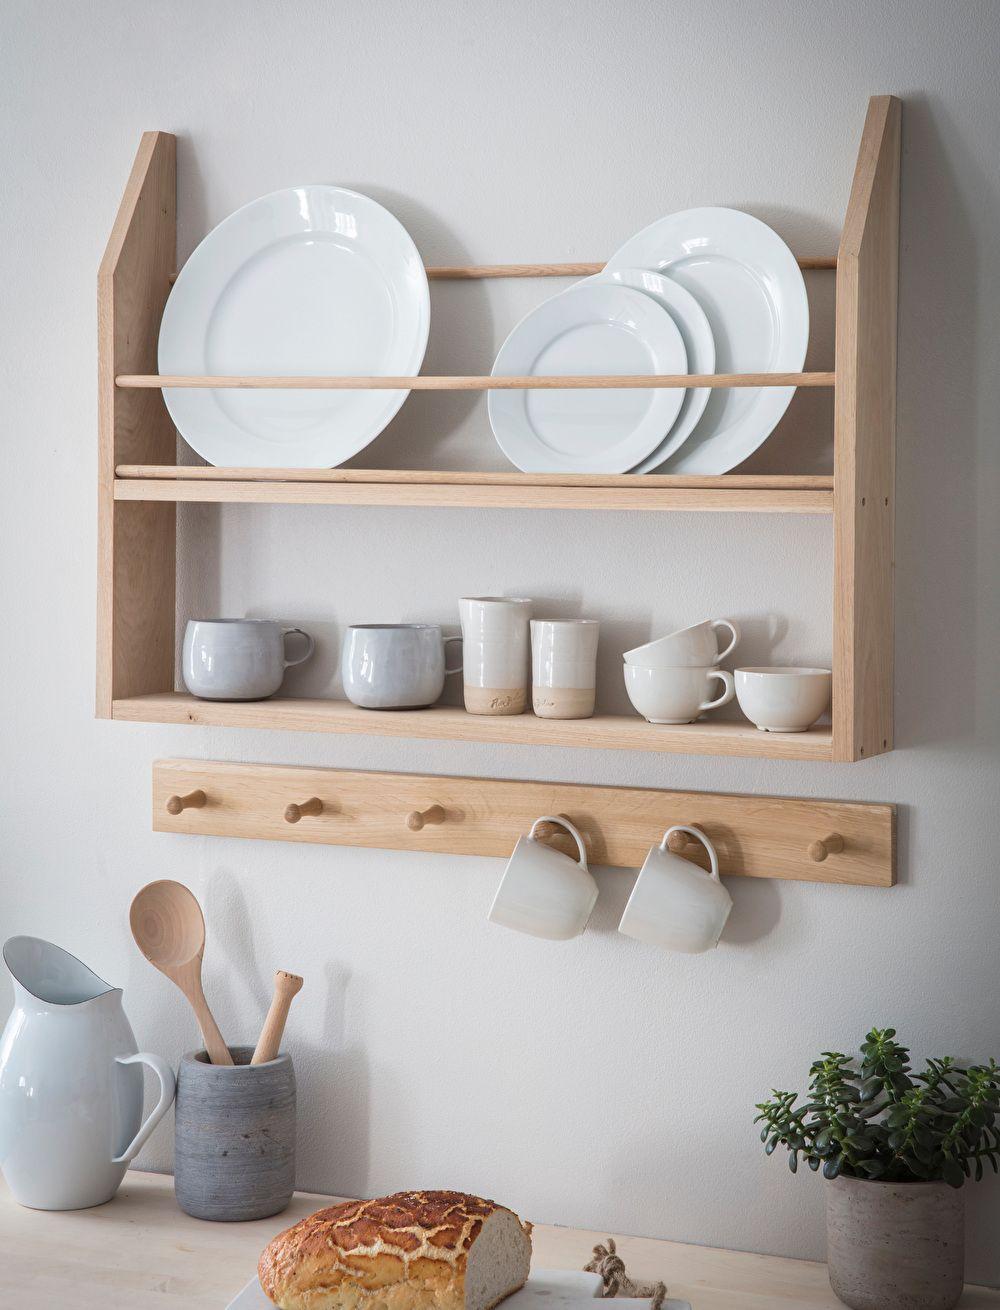 Hambledon Plate Shelf Plate Shelves Wall Mounted Kitchen Storage Shelves